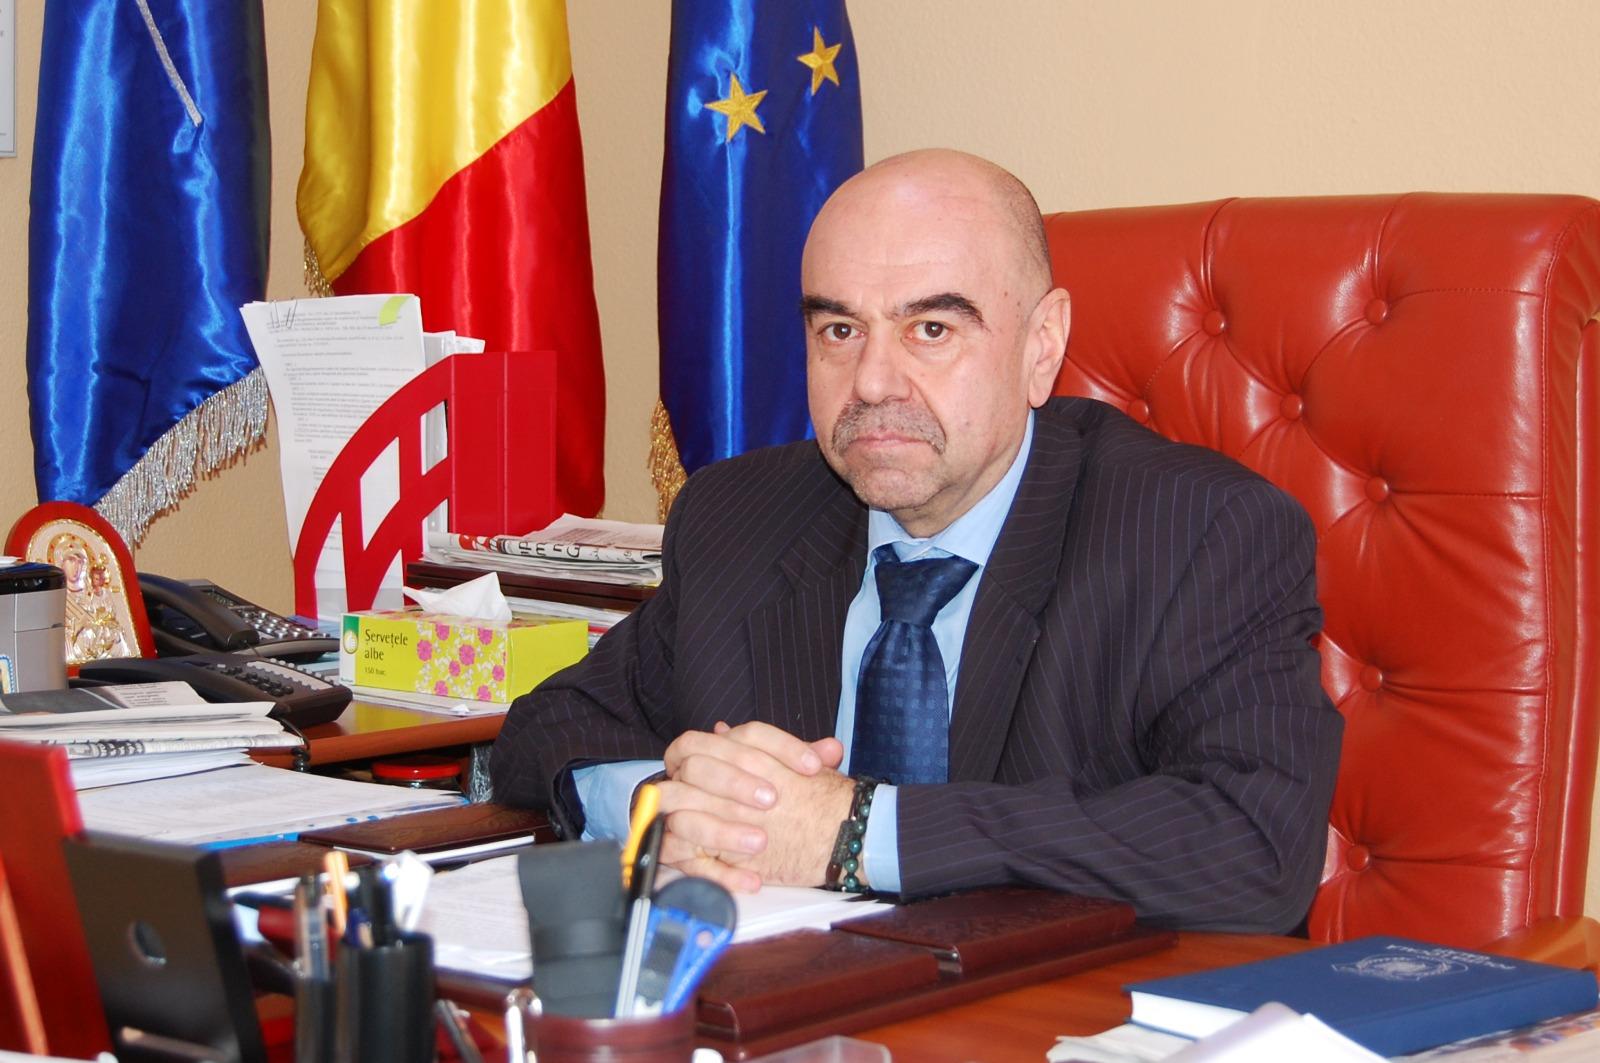 Mihai MANOLIU